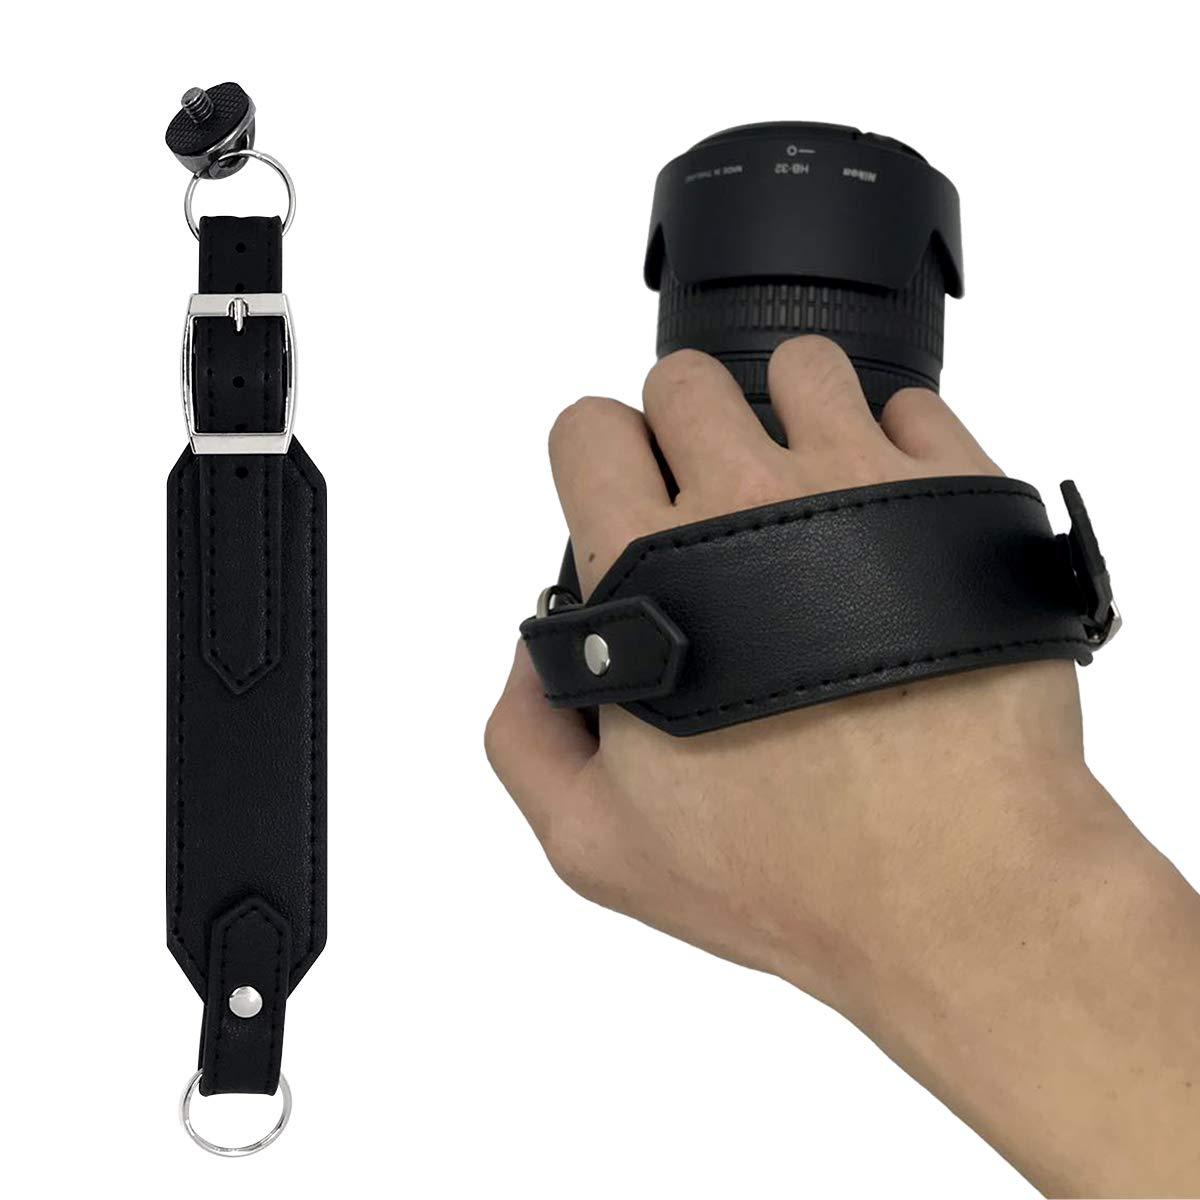 Homelex Leather Camera Hand Grip Strap SLR/DSLR Black Leather Wrist Strap